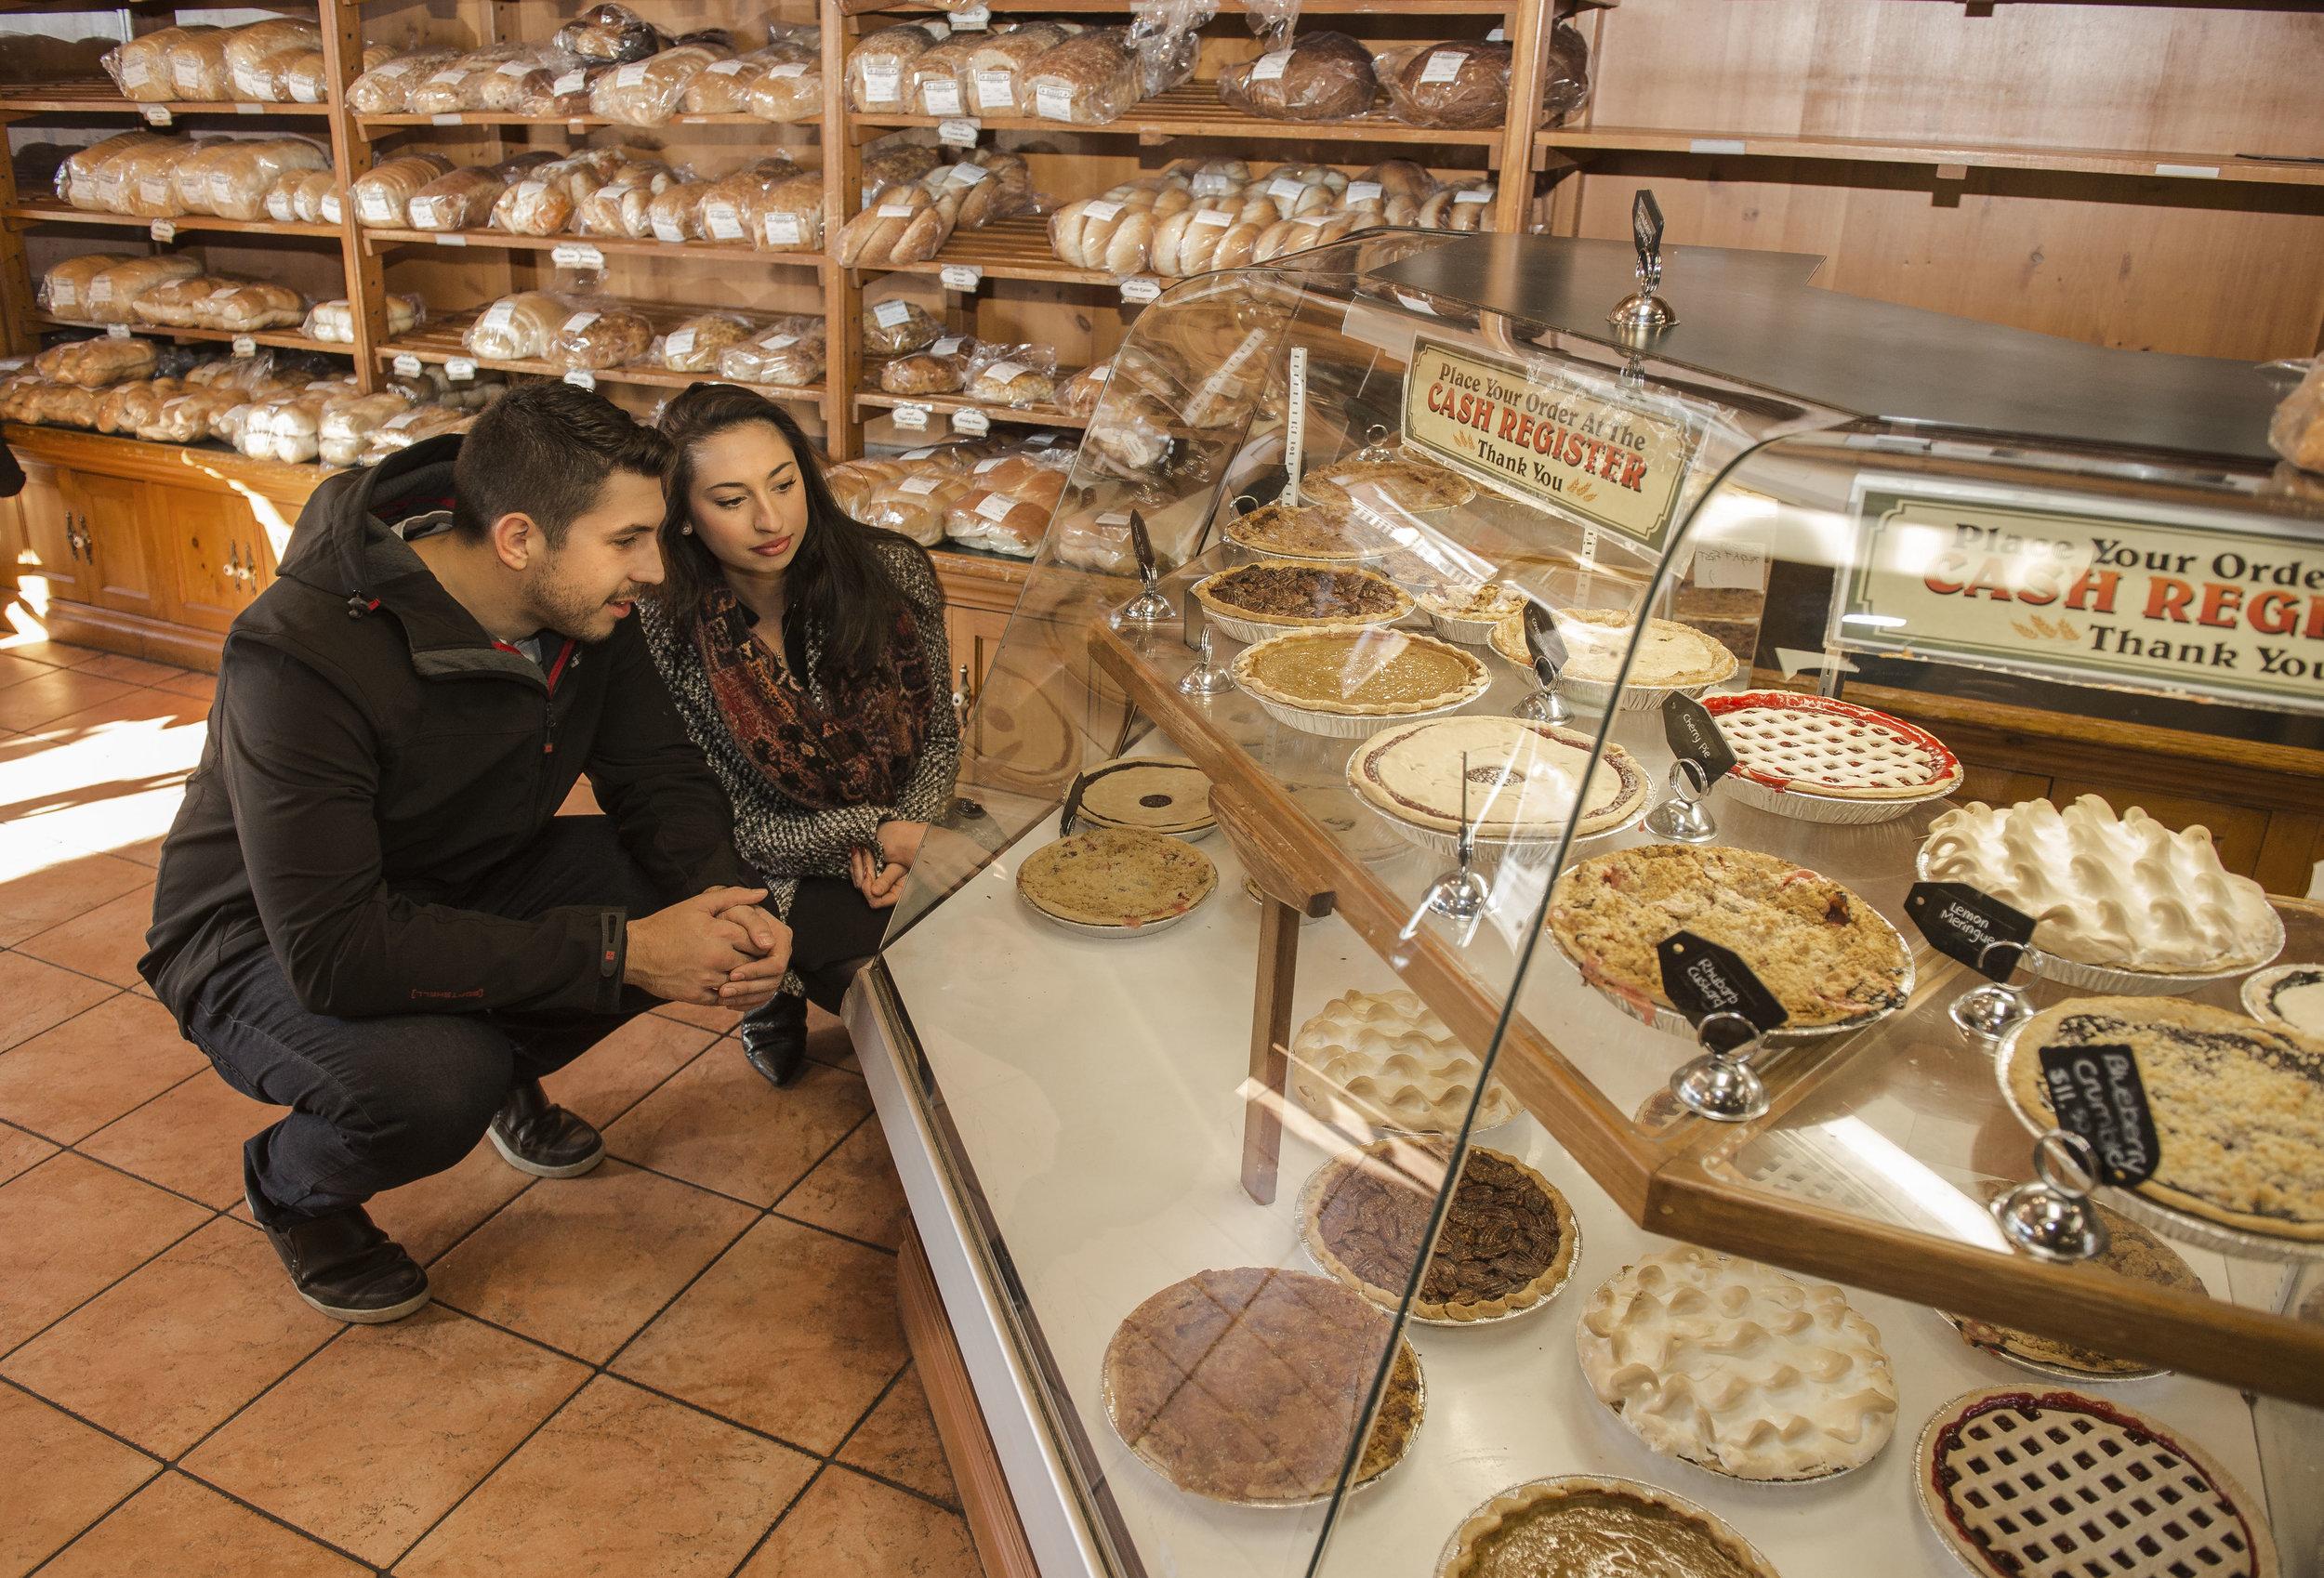 Stone Crock Kitchen Bakery.jpg